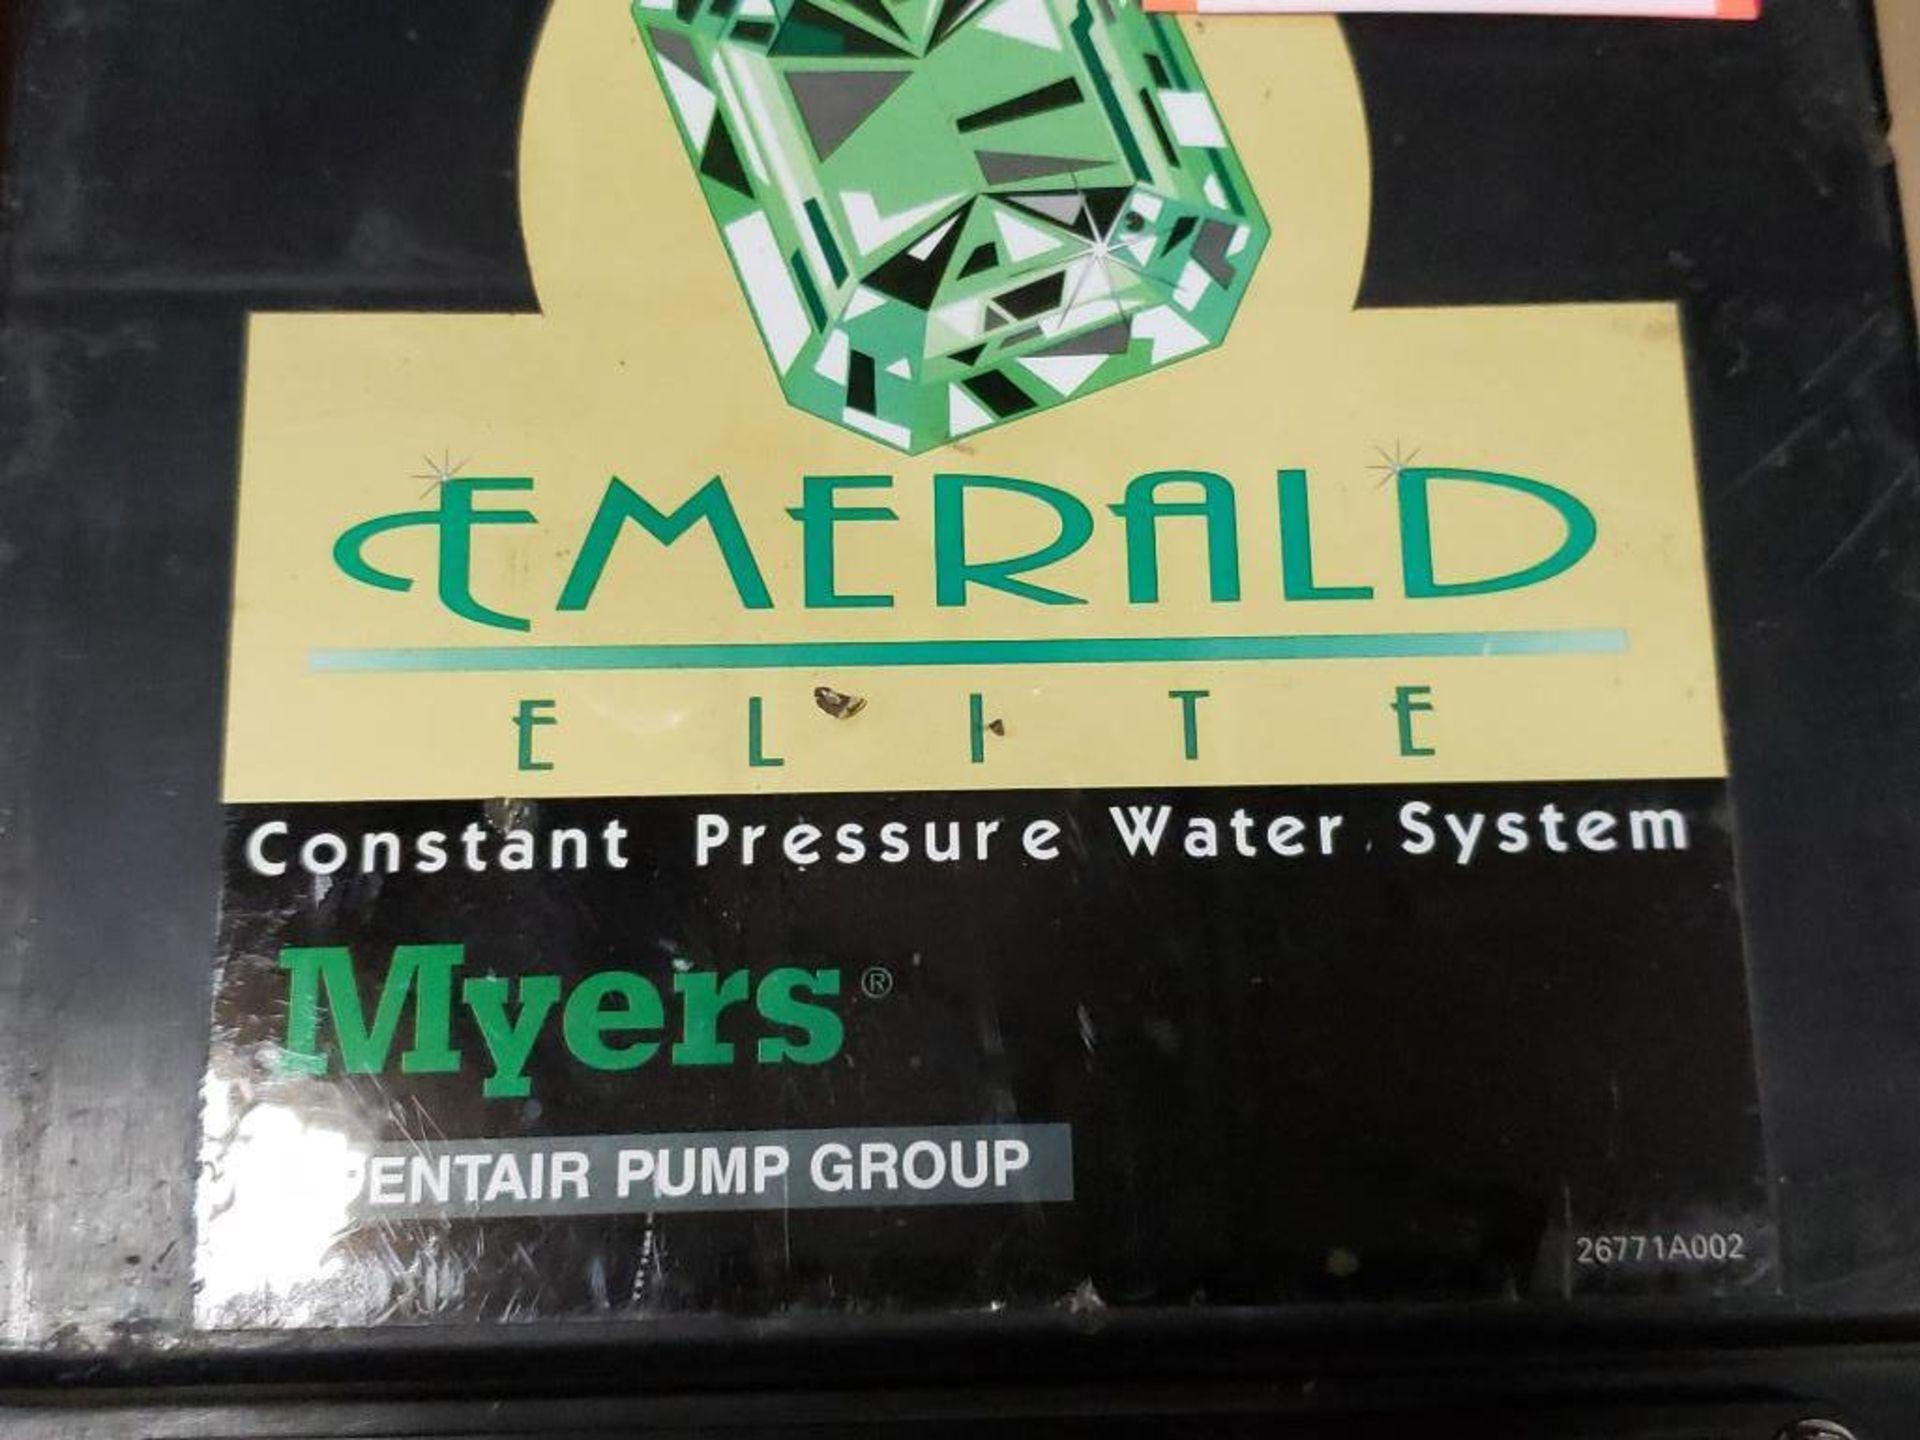 Emerald Elite Myers pentair pump group 26493D001. GEM10-CB. - Image 2 of 3